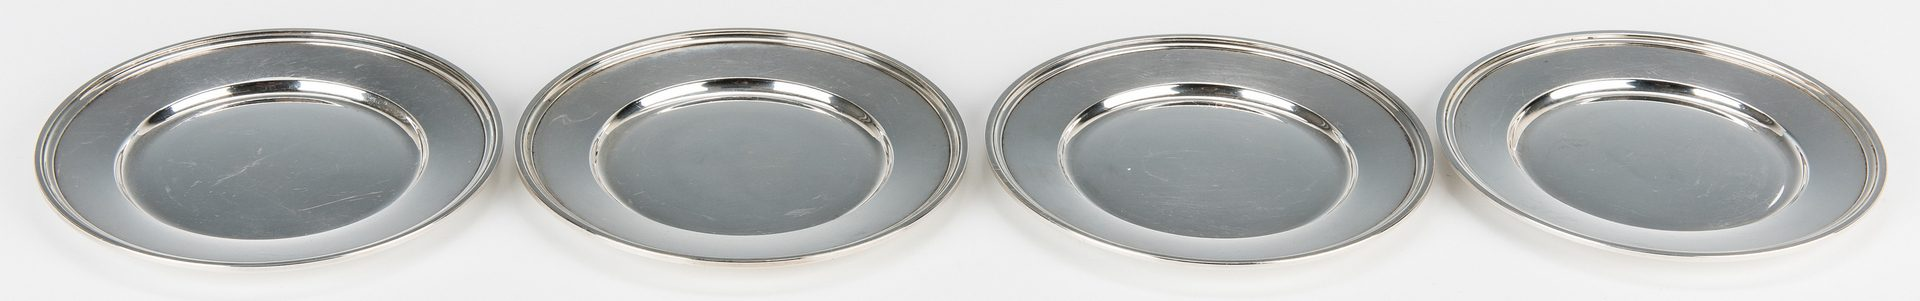 Lot 707: Tiffany & International Sterling Silver Plates